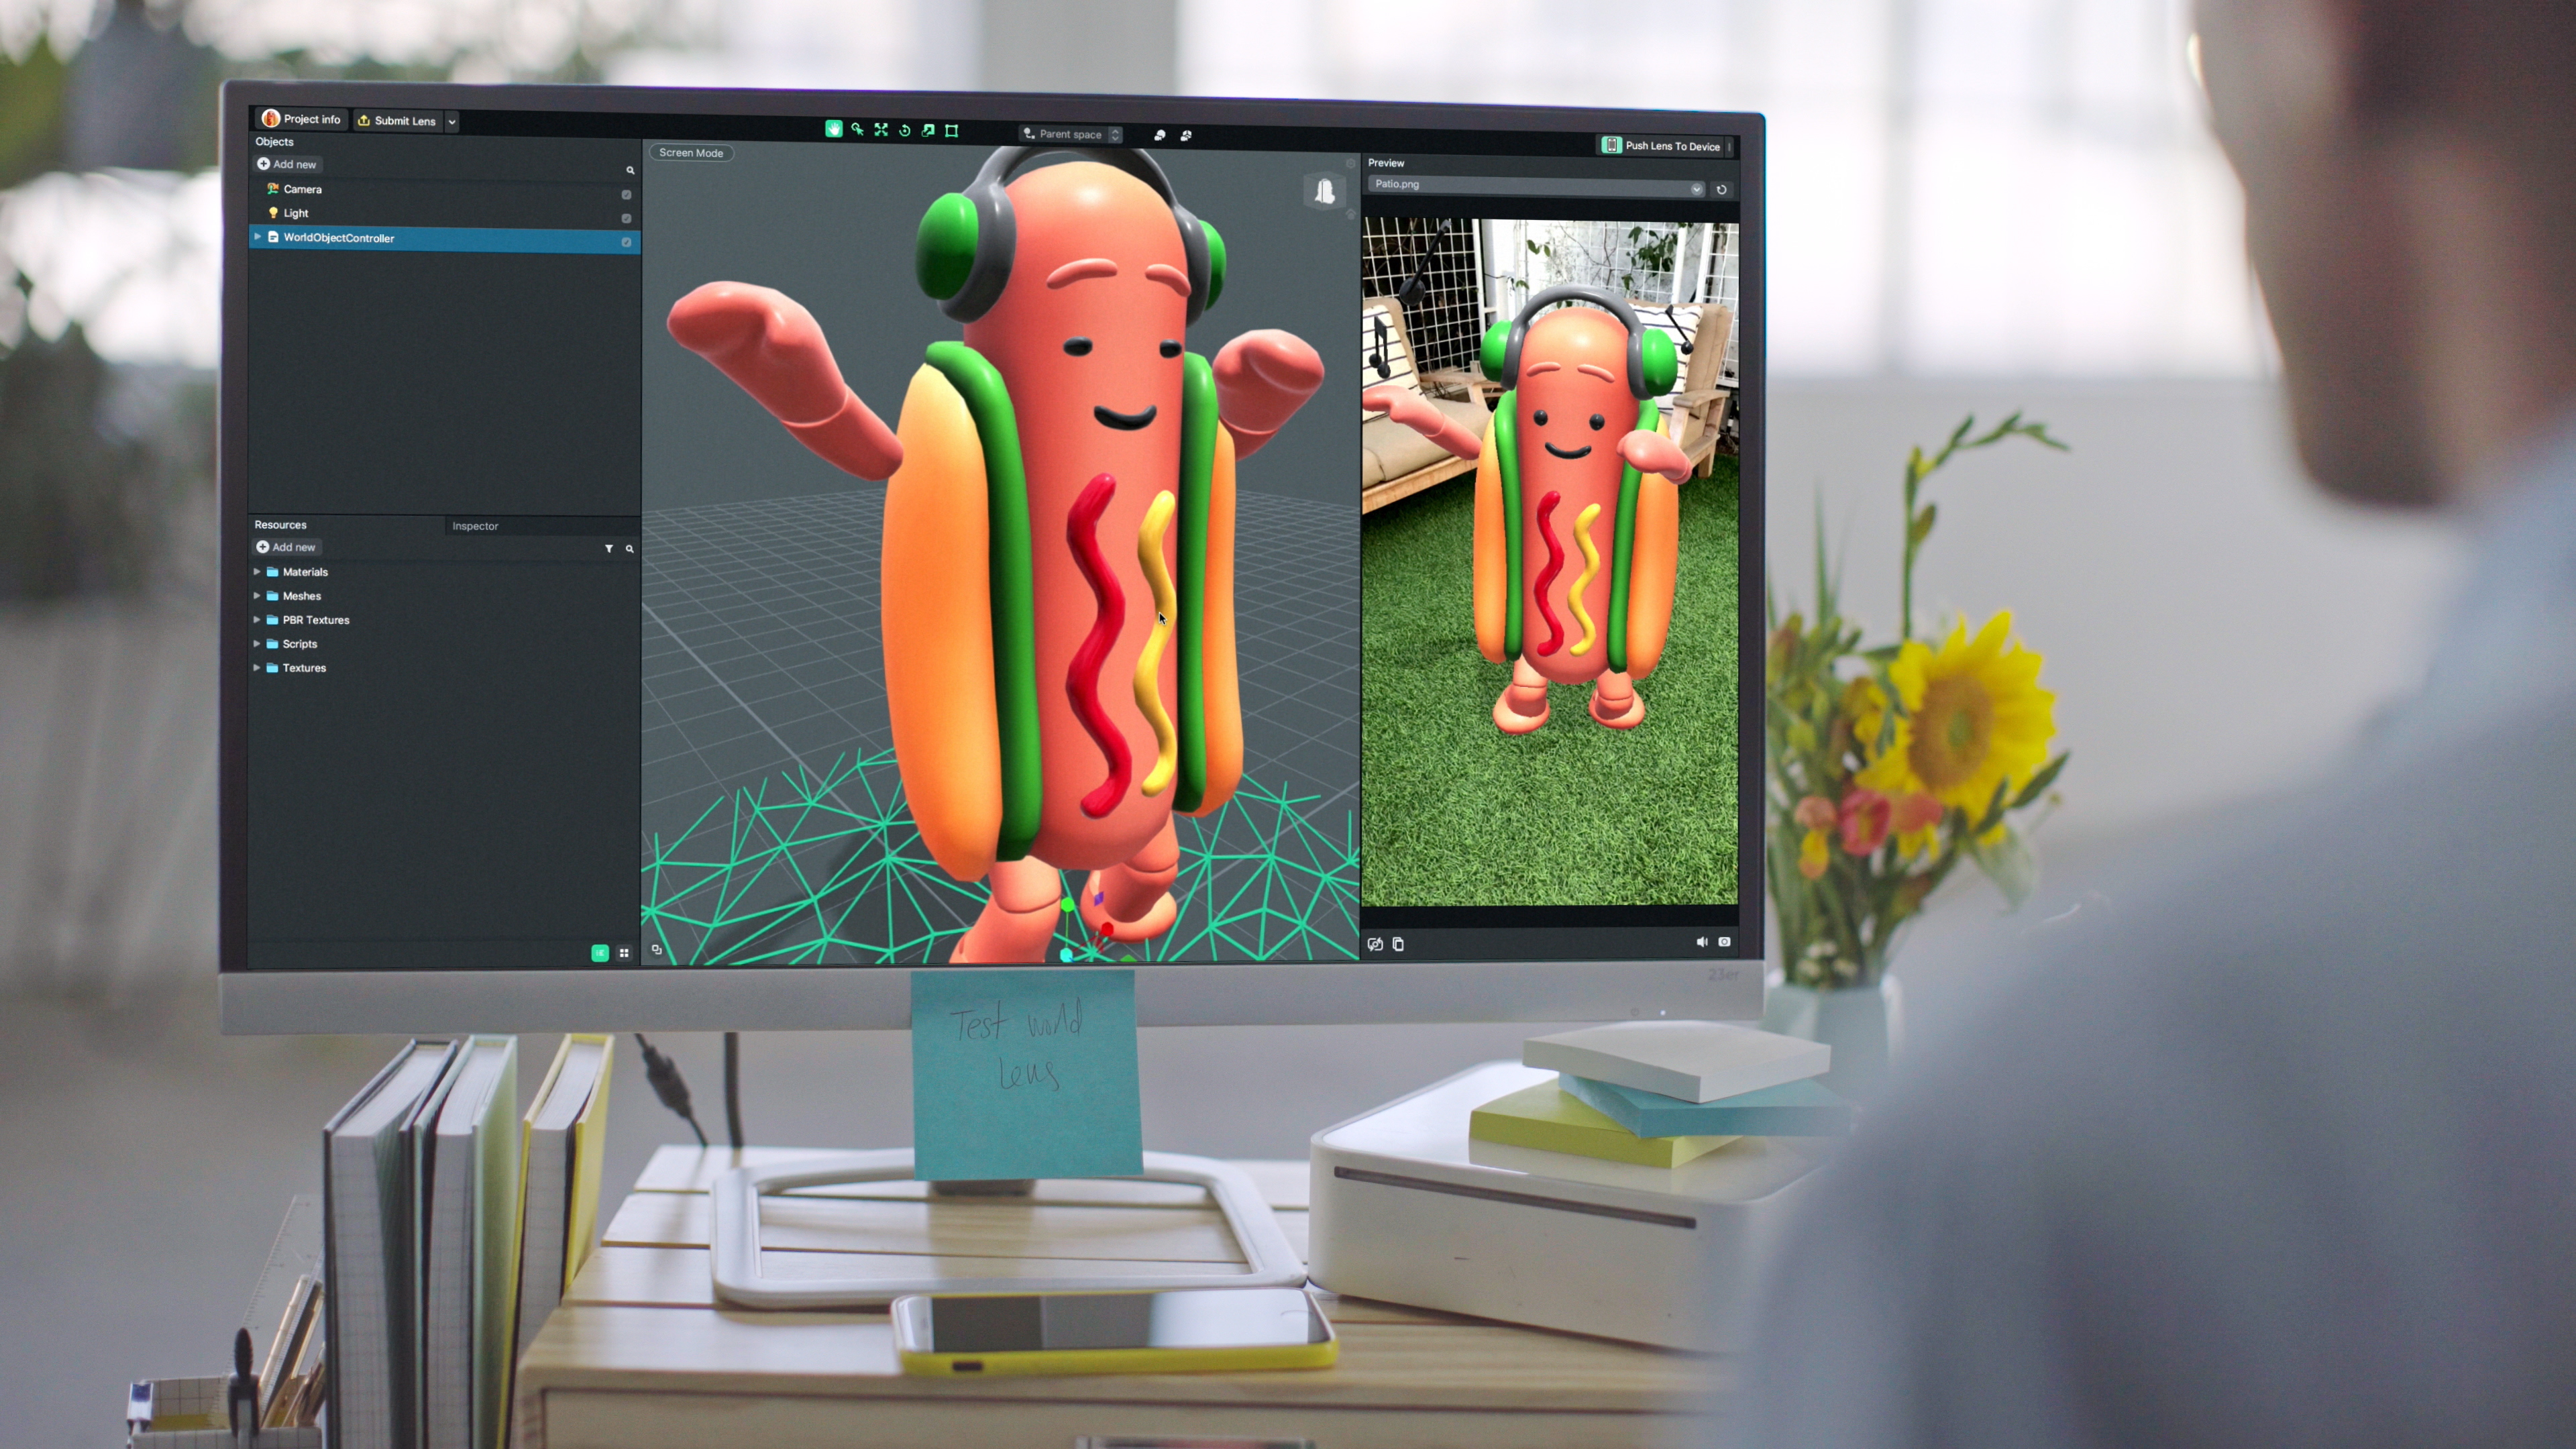 An augmented reality dancing hotdog on a computer screen